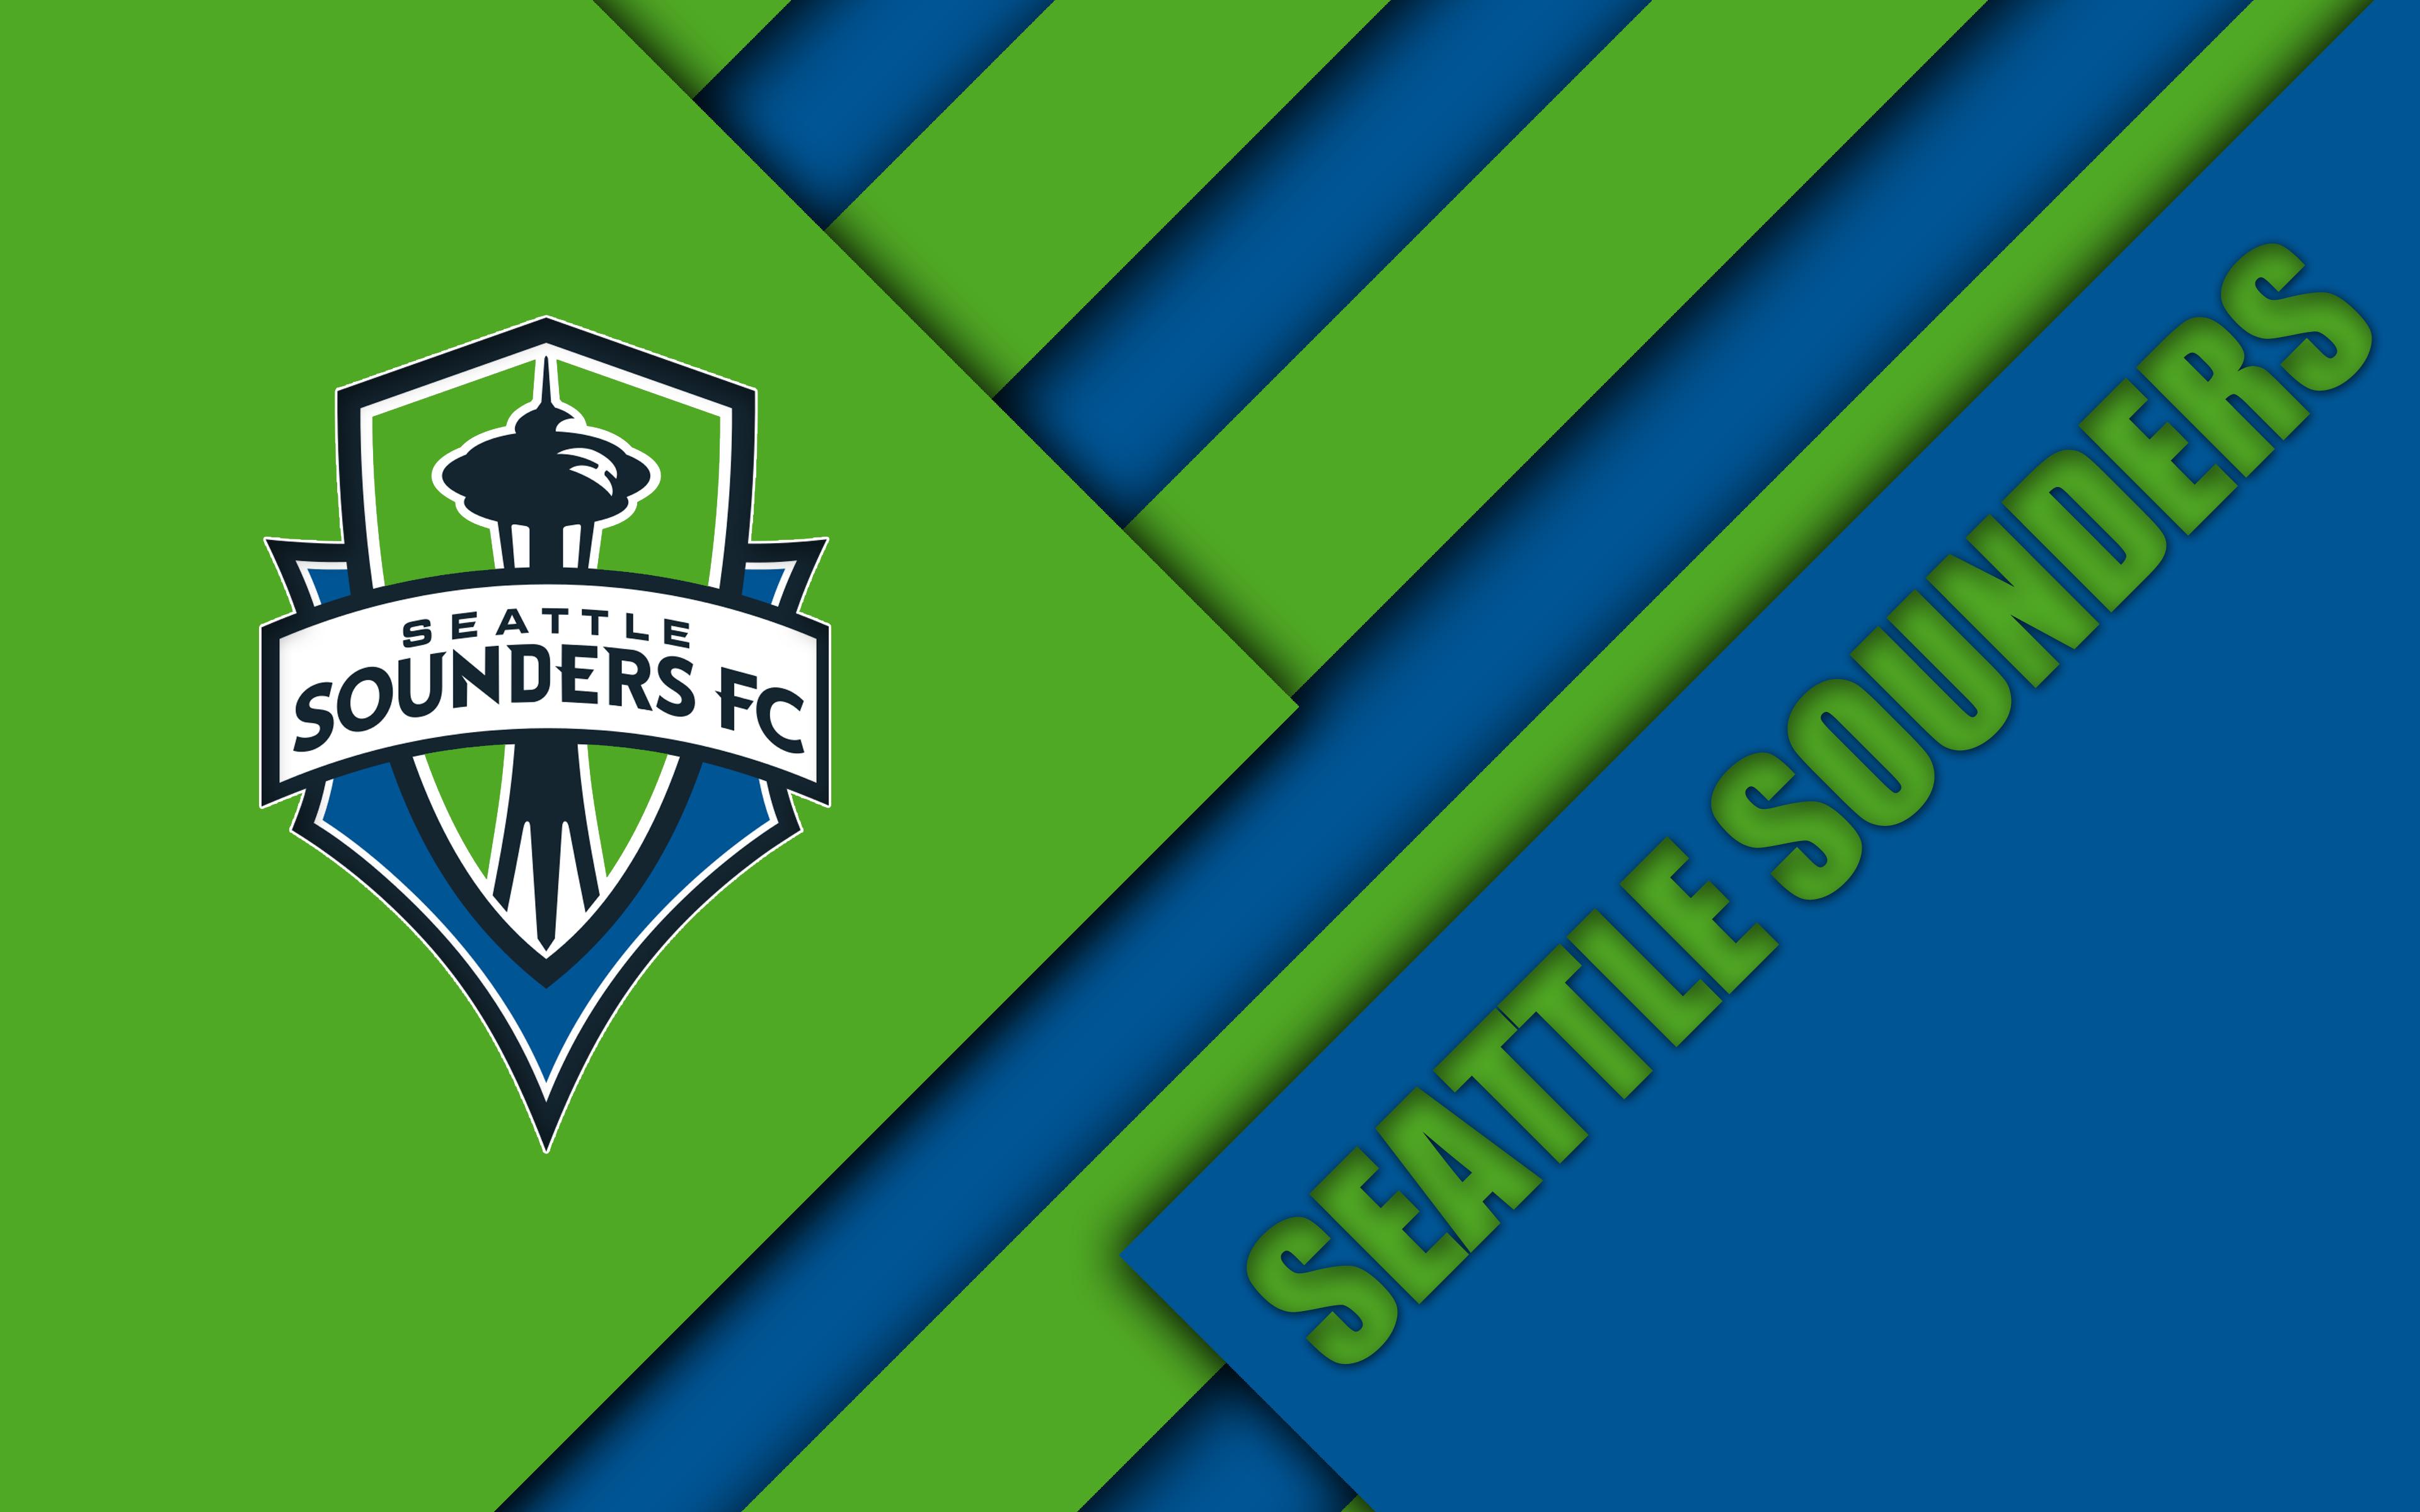 Seattle Sounders FC 4k Ultra HD Wallpaper Background Image 3840x2400